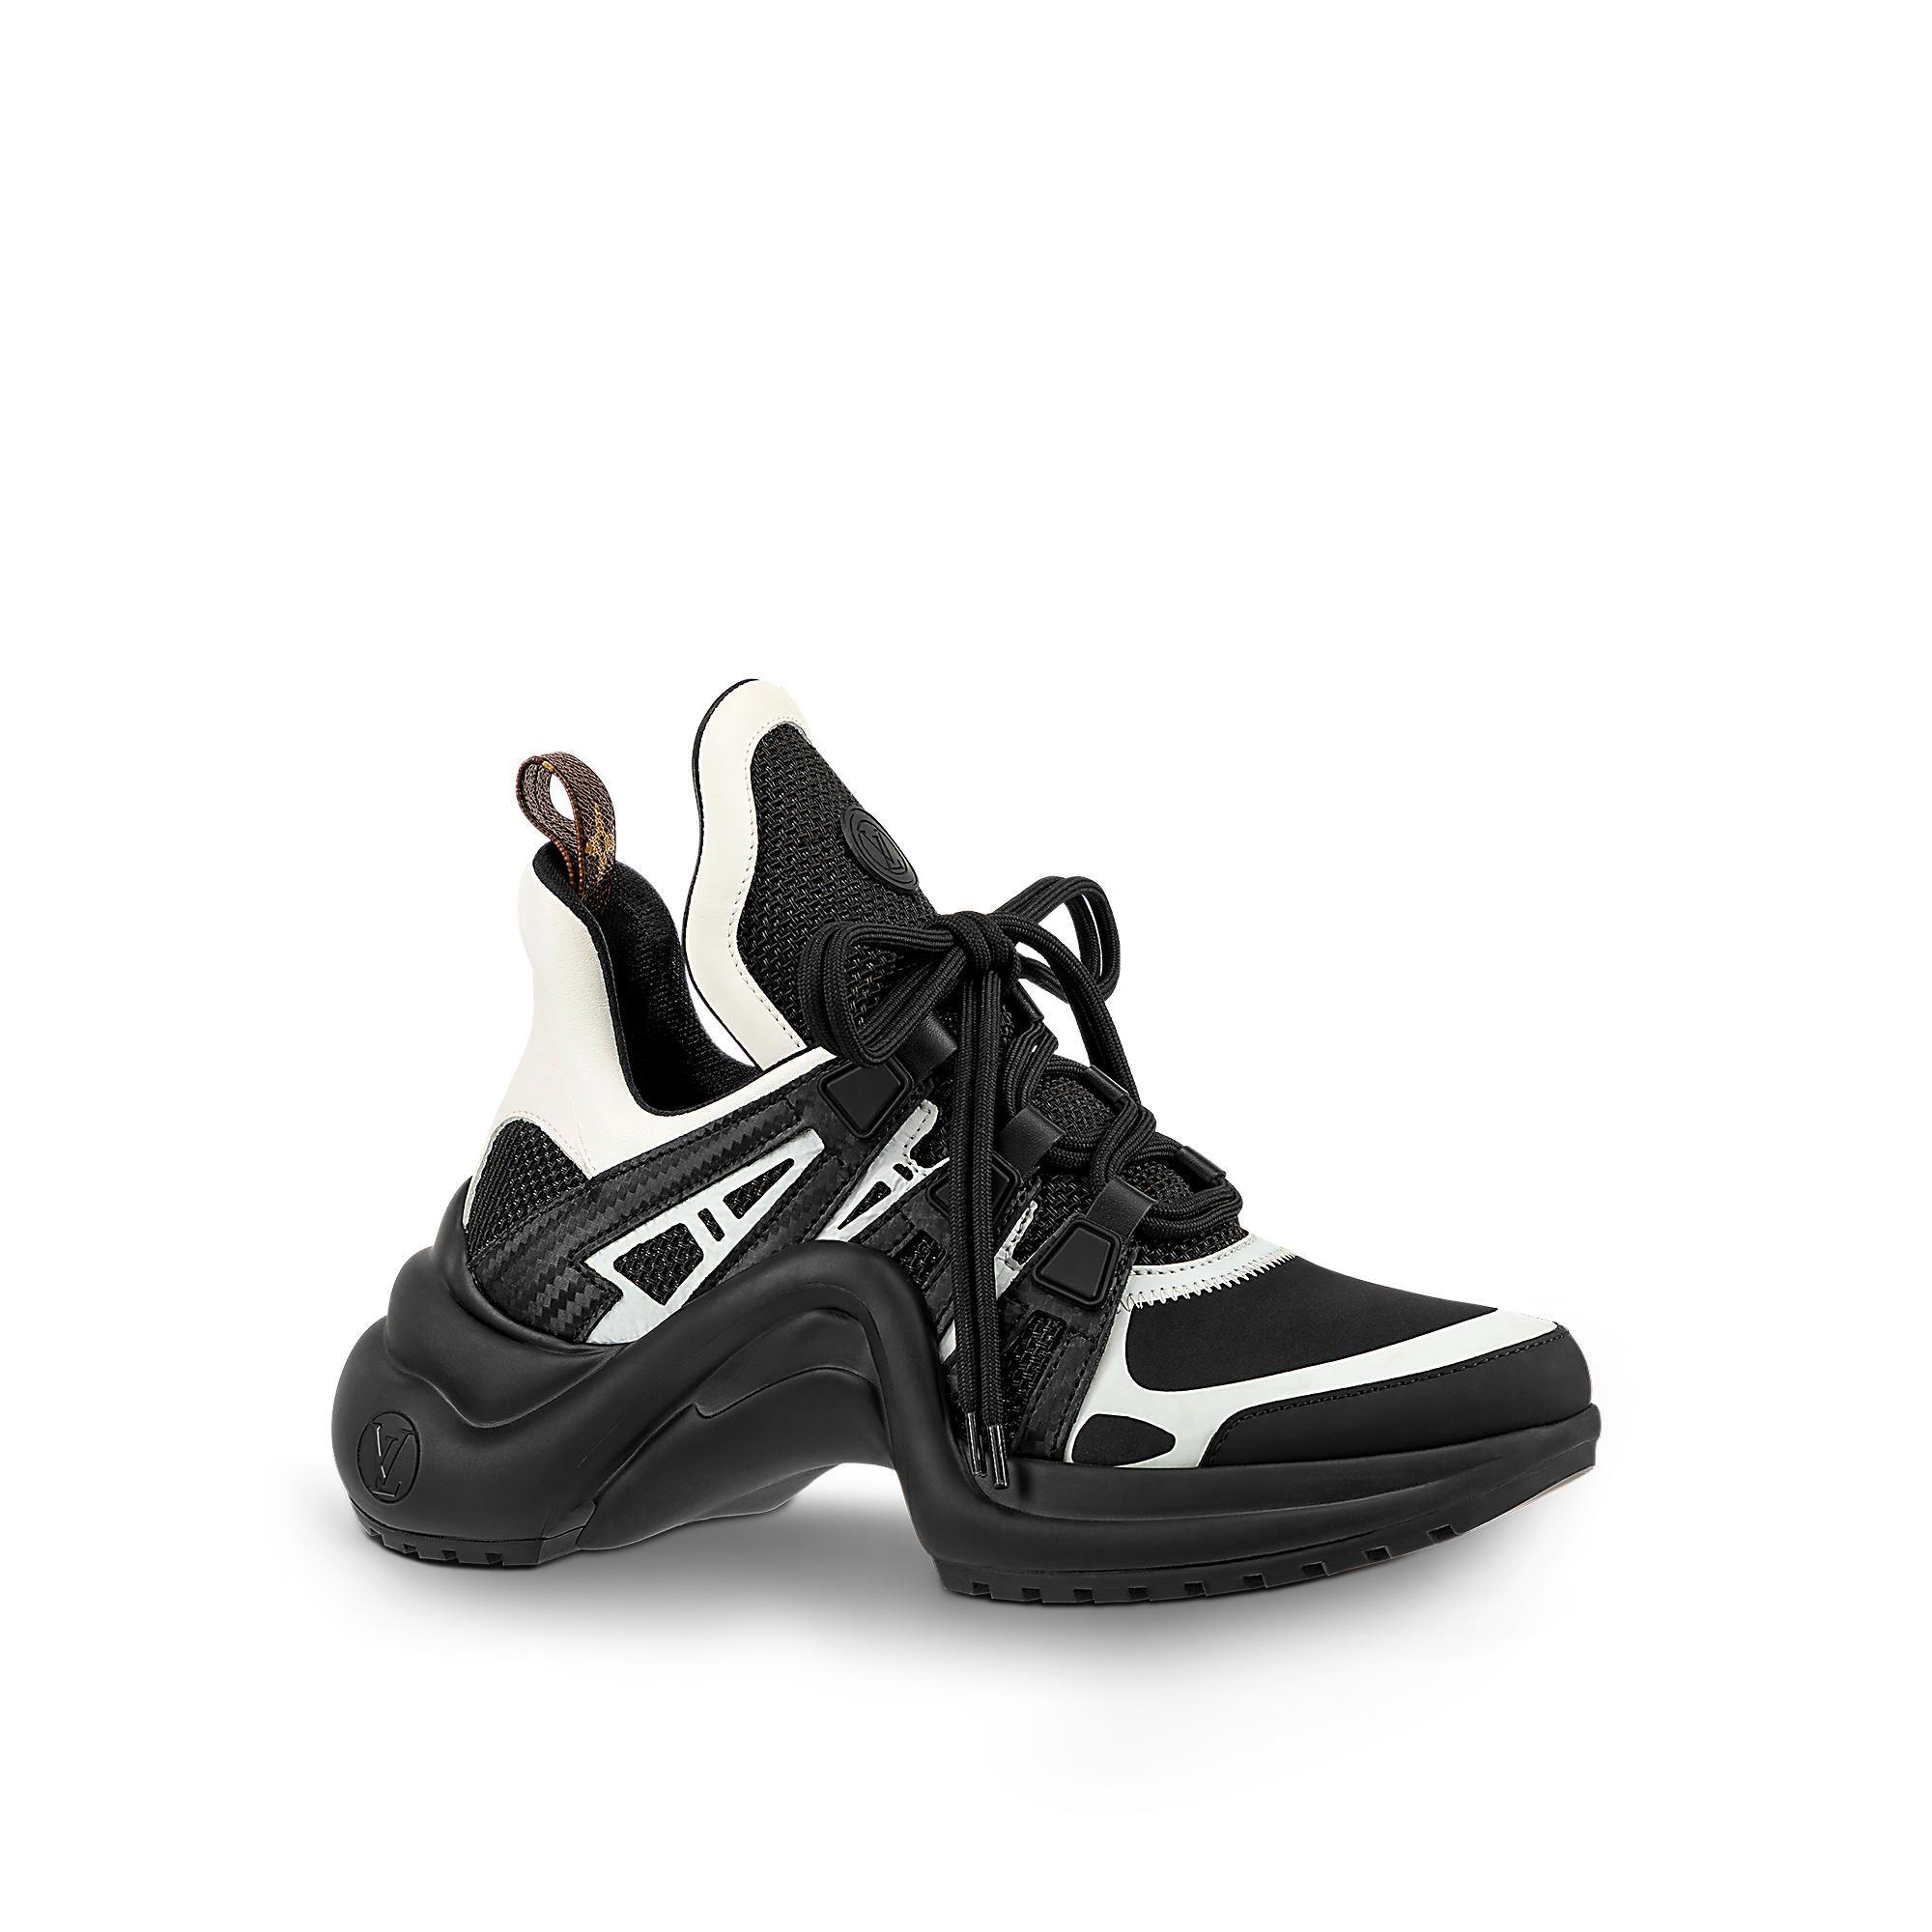 Lv Archlight Sneaker Via Louis Vuitton Louis Vuitton Sneakers Women Sport Sneakers Sneakers